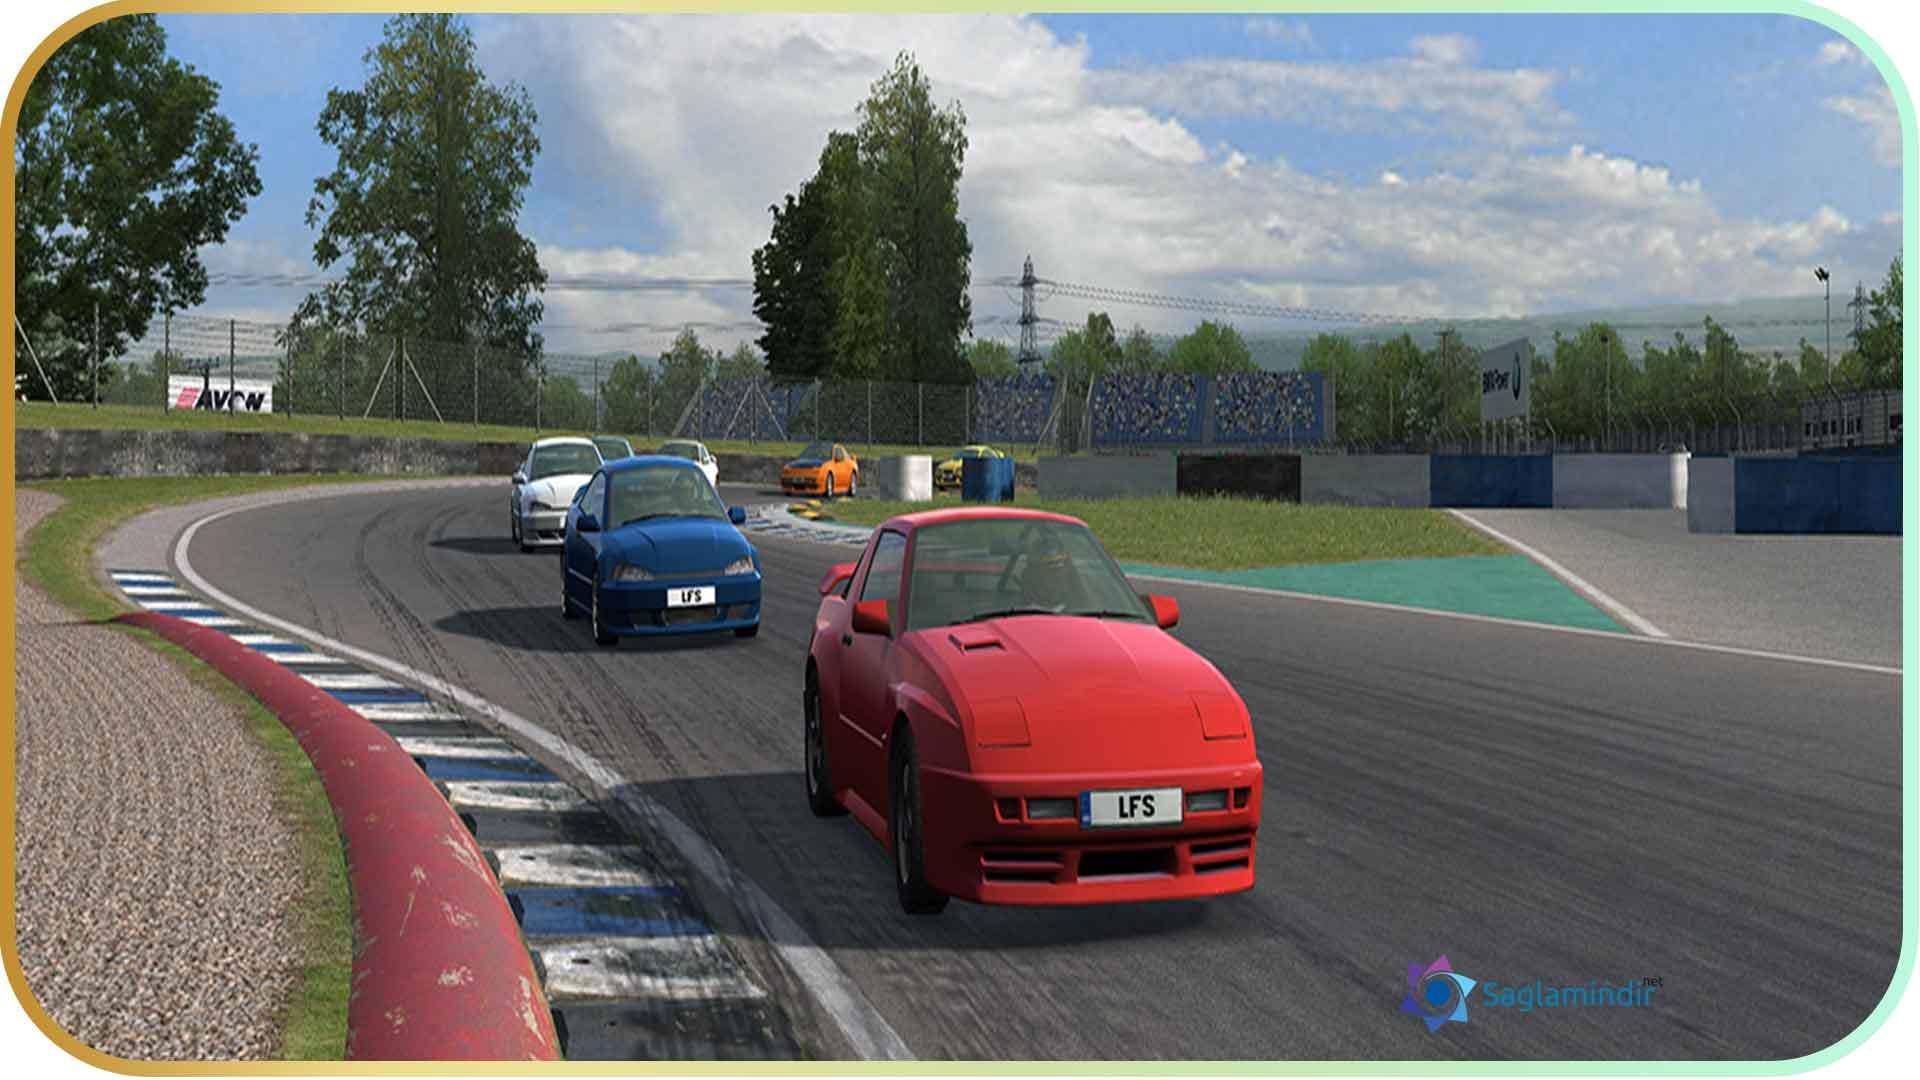 Live For Speed saglamindir